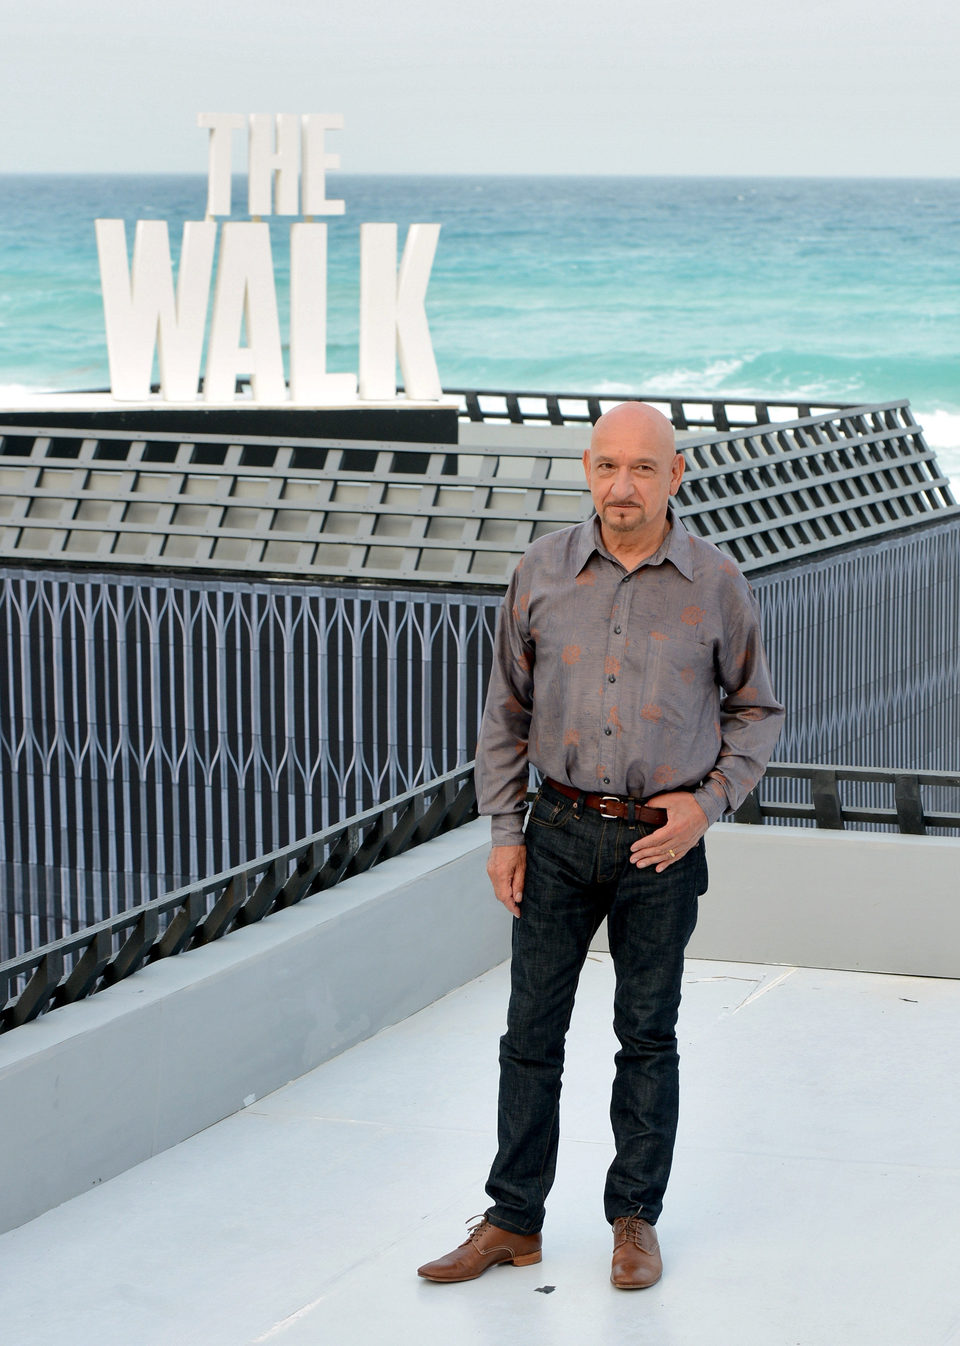 Ben Kingsley presenta 'The Walk' en el Summer of Sony 2015